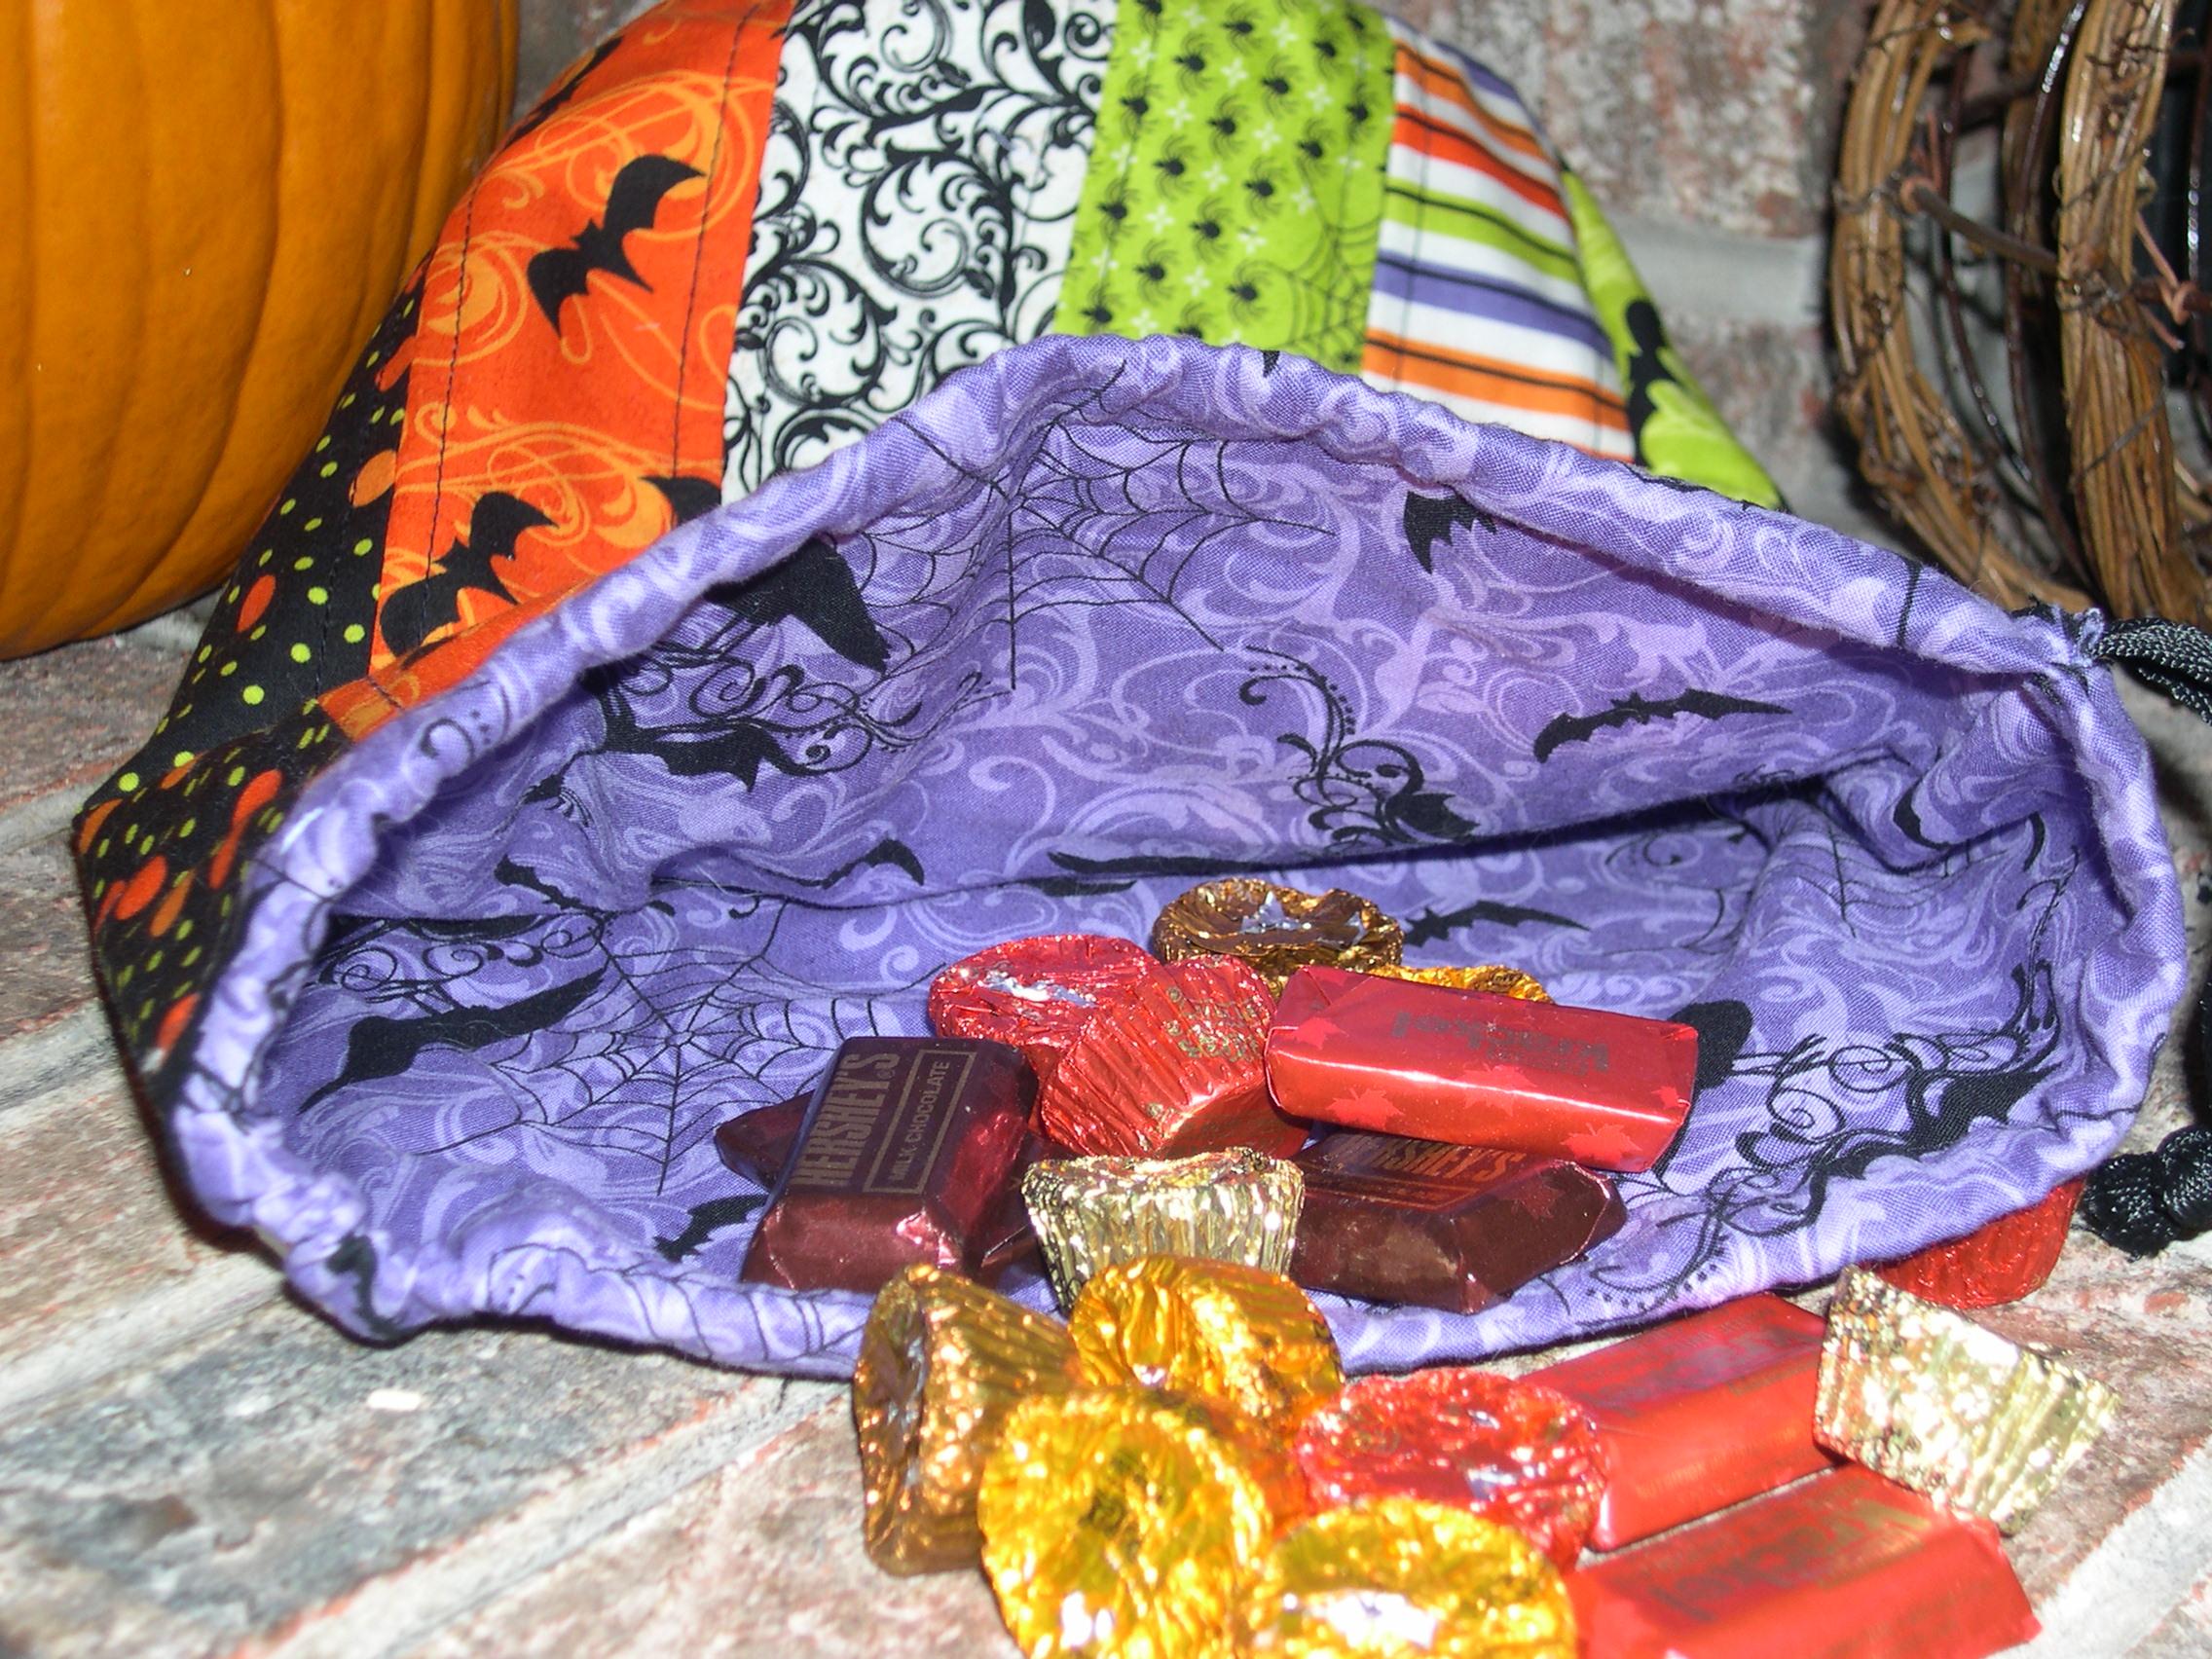 purple treat sack